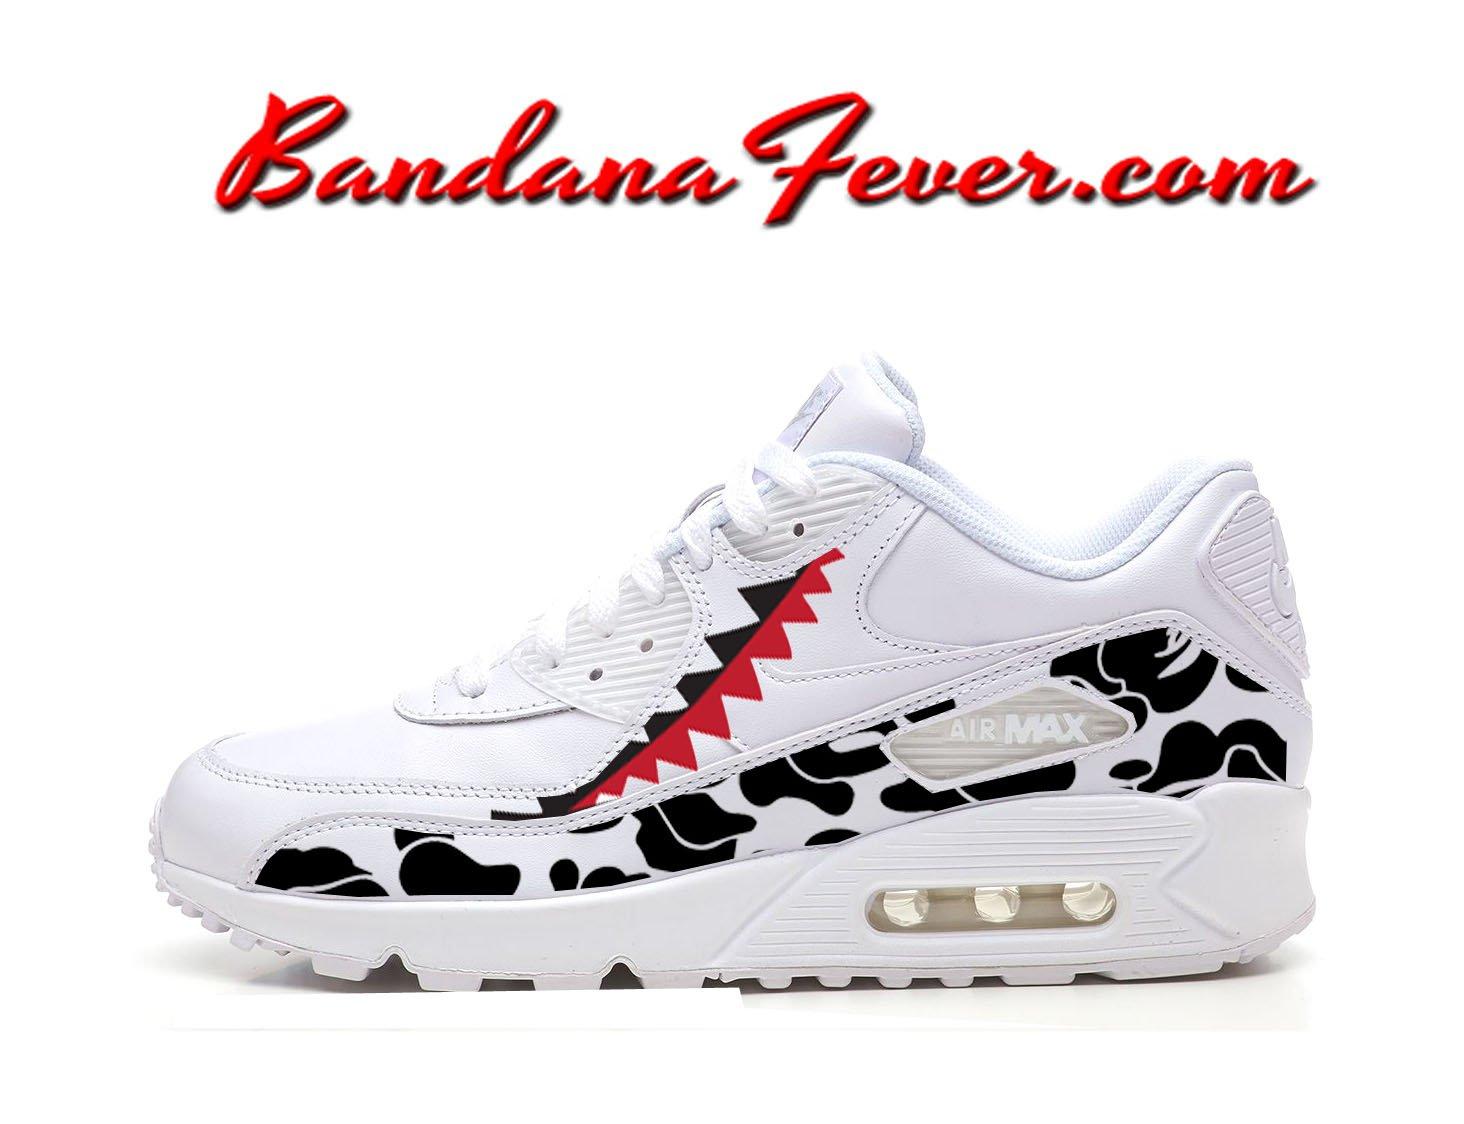 Custom Bape Camo Shark Nike Air Max 90 Shoes Ultra White 13de50fba9235